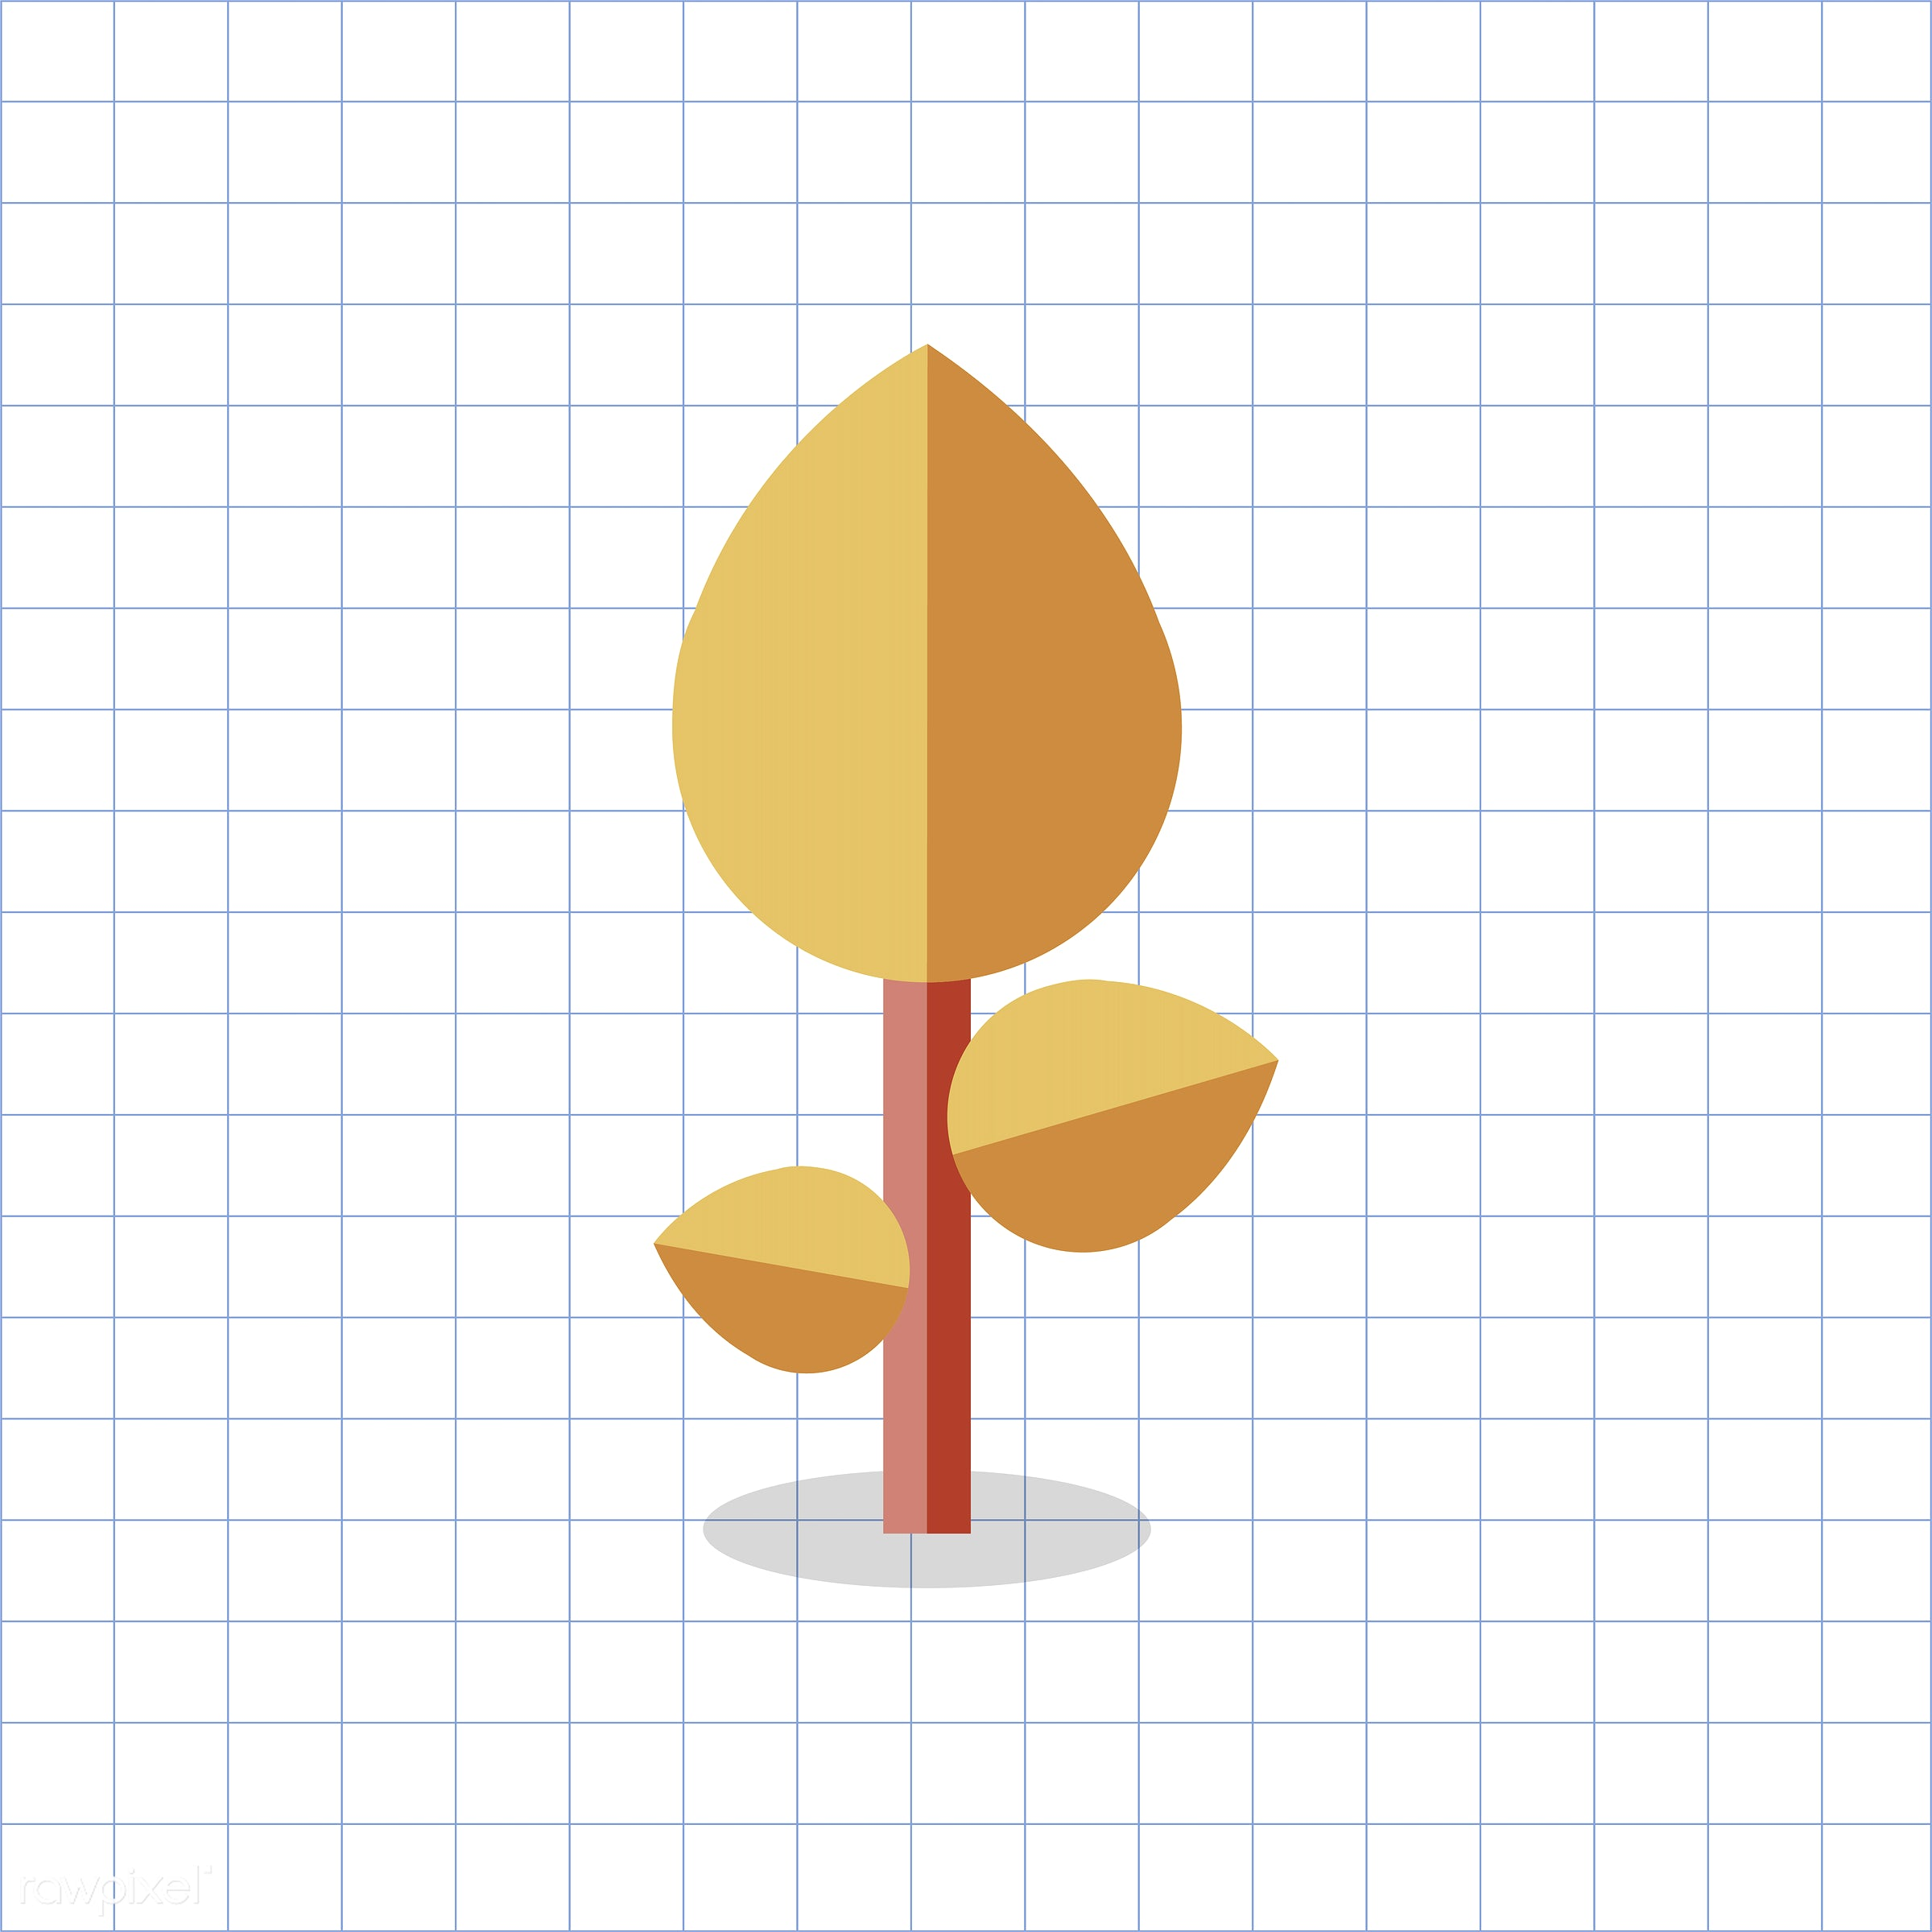 vector, graphic, illustration, icon, symbol, colorful, cute, plant, tree, nature, orange